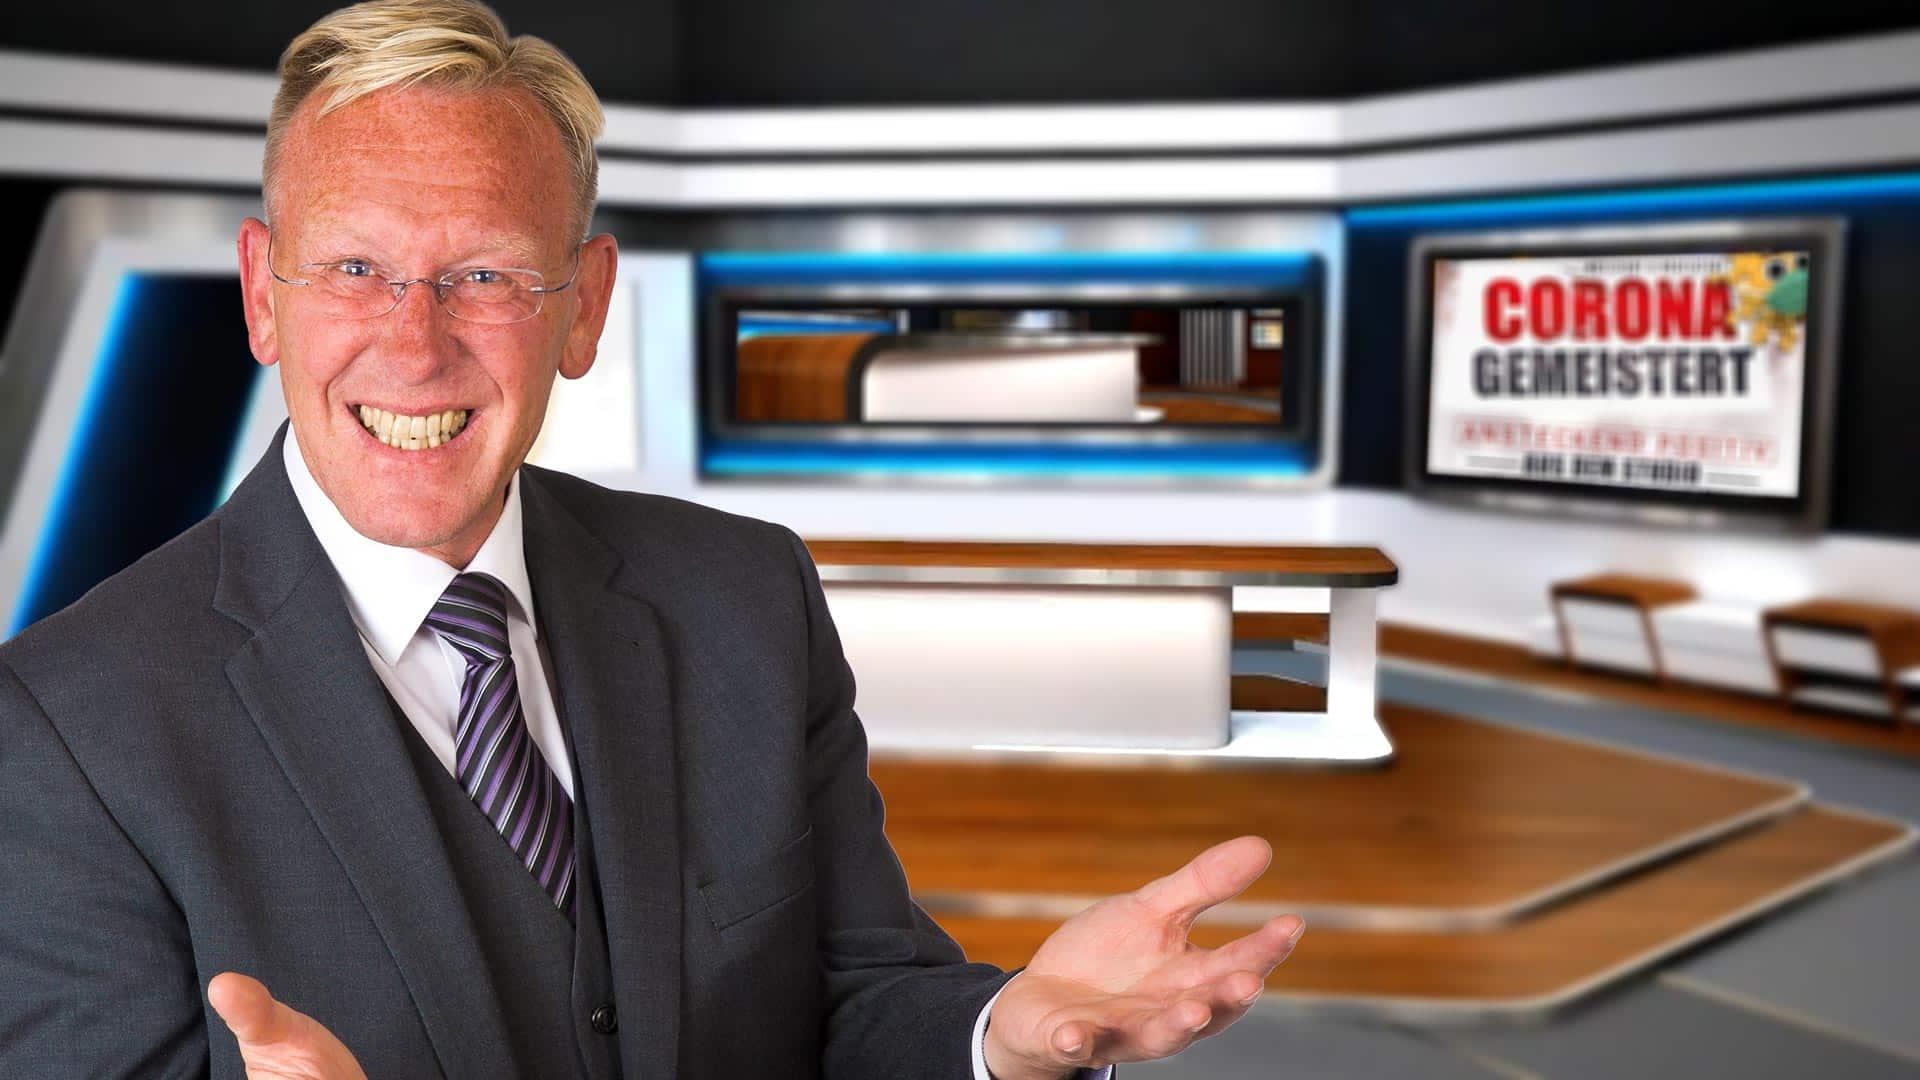 TV-Moderator Dirk Rabis Programmhinweis. TV-Studio der ExpertenTalkshow.